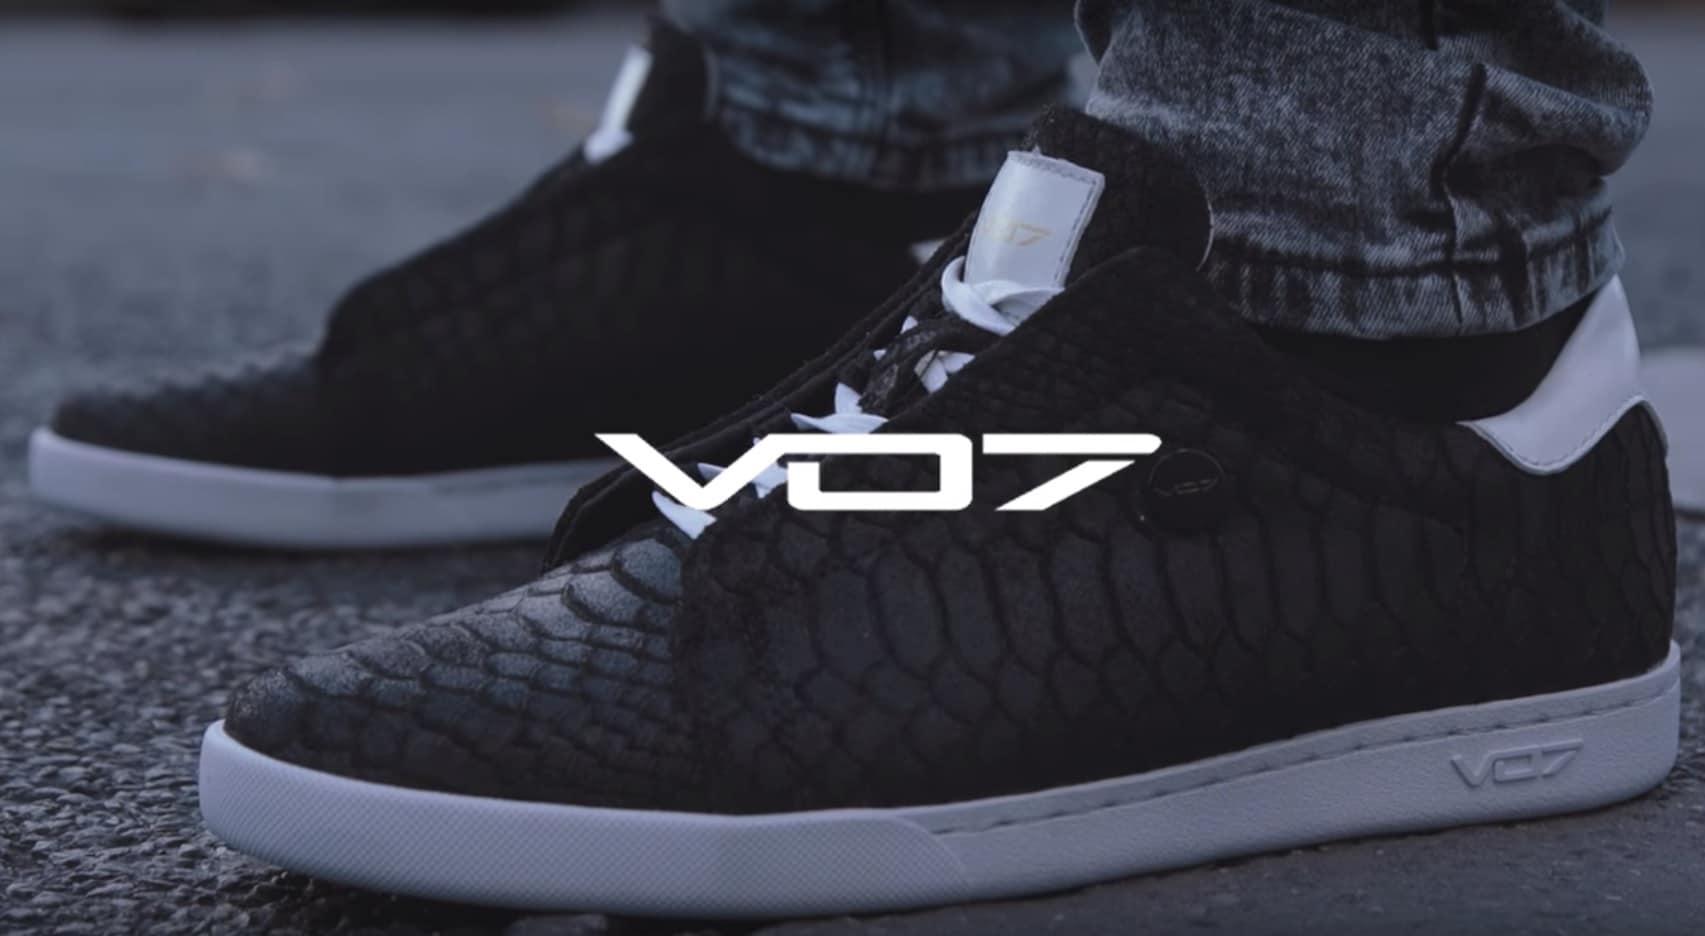 onyx vo7